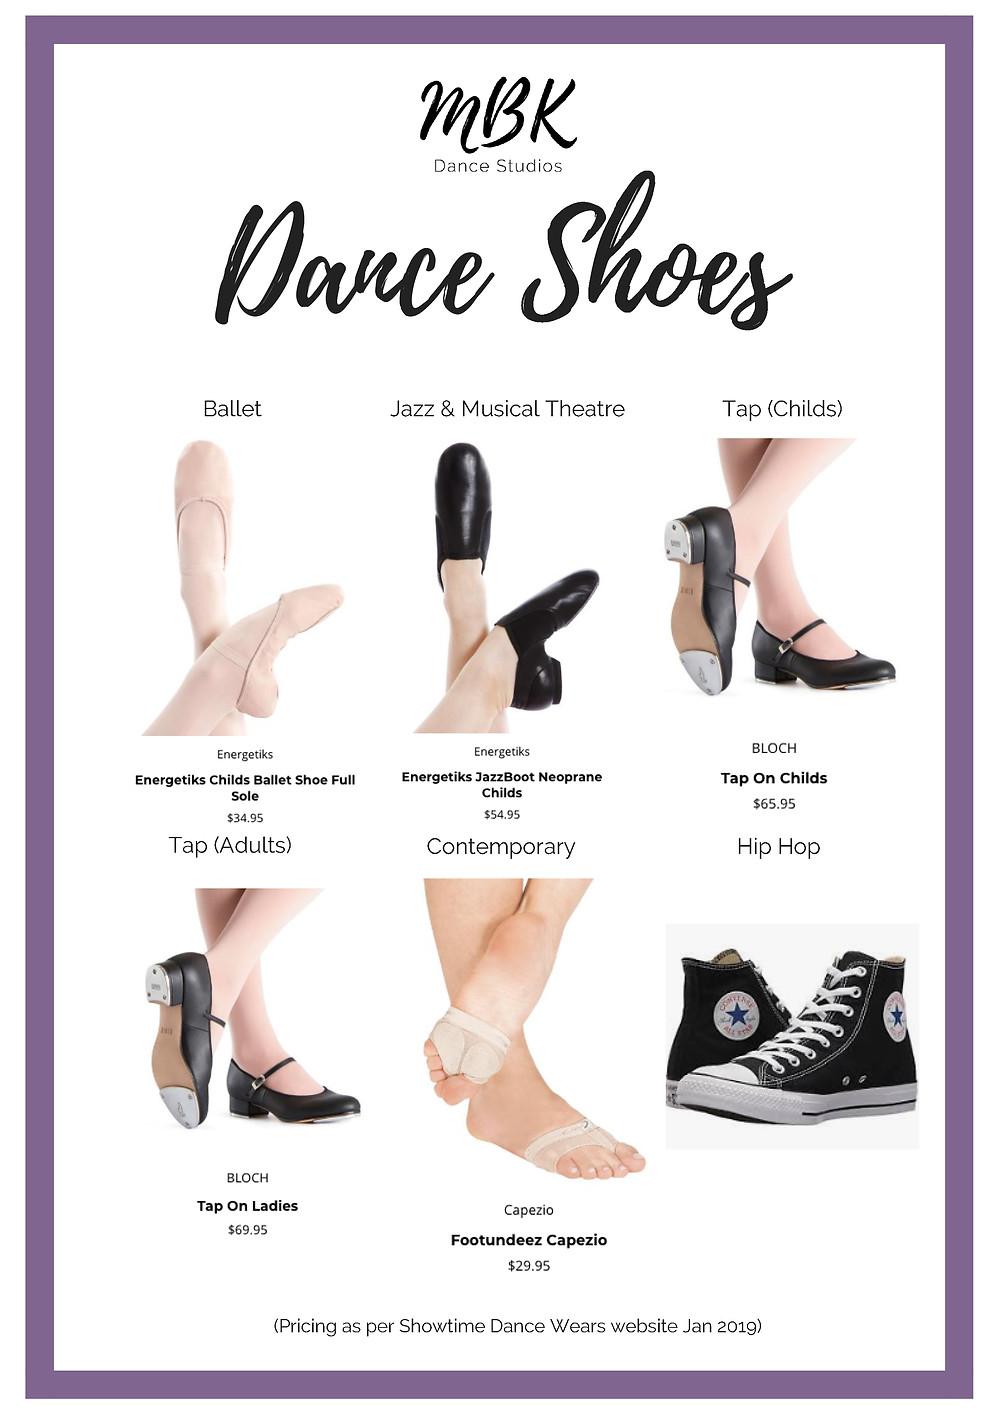 Dance Class Shoe Requirements